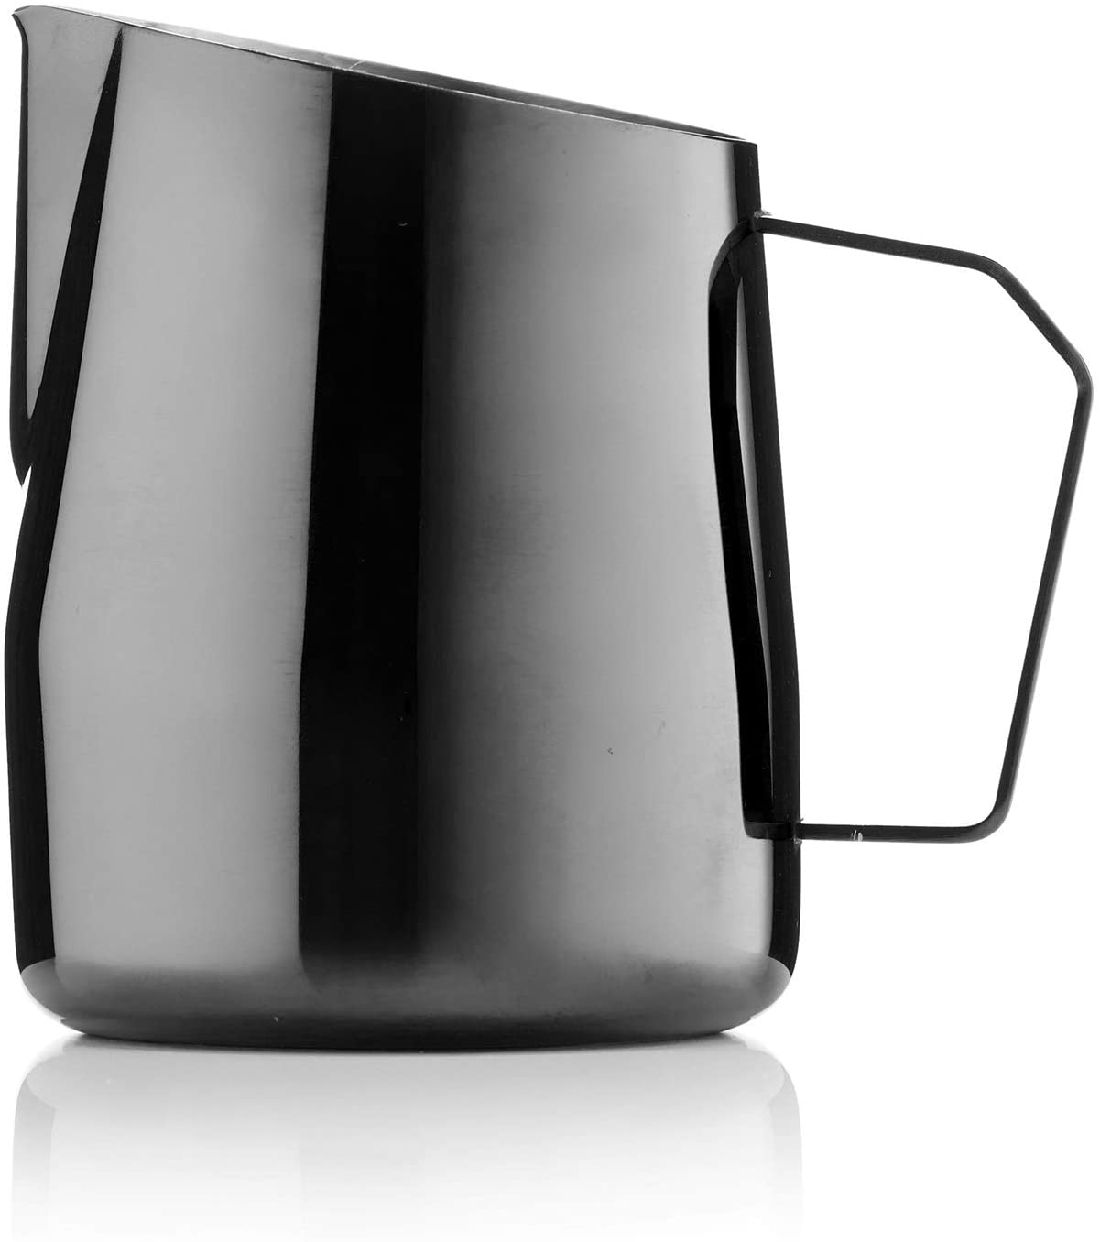 Barista&Co(バリスタアンドコー)Dial In Milk Pitcher 420ml Blackの商品画像